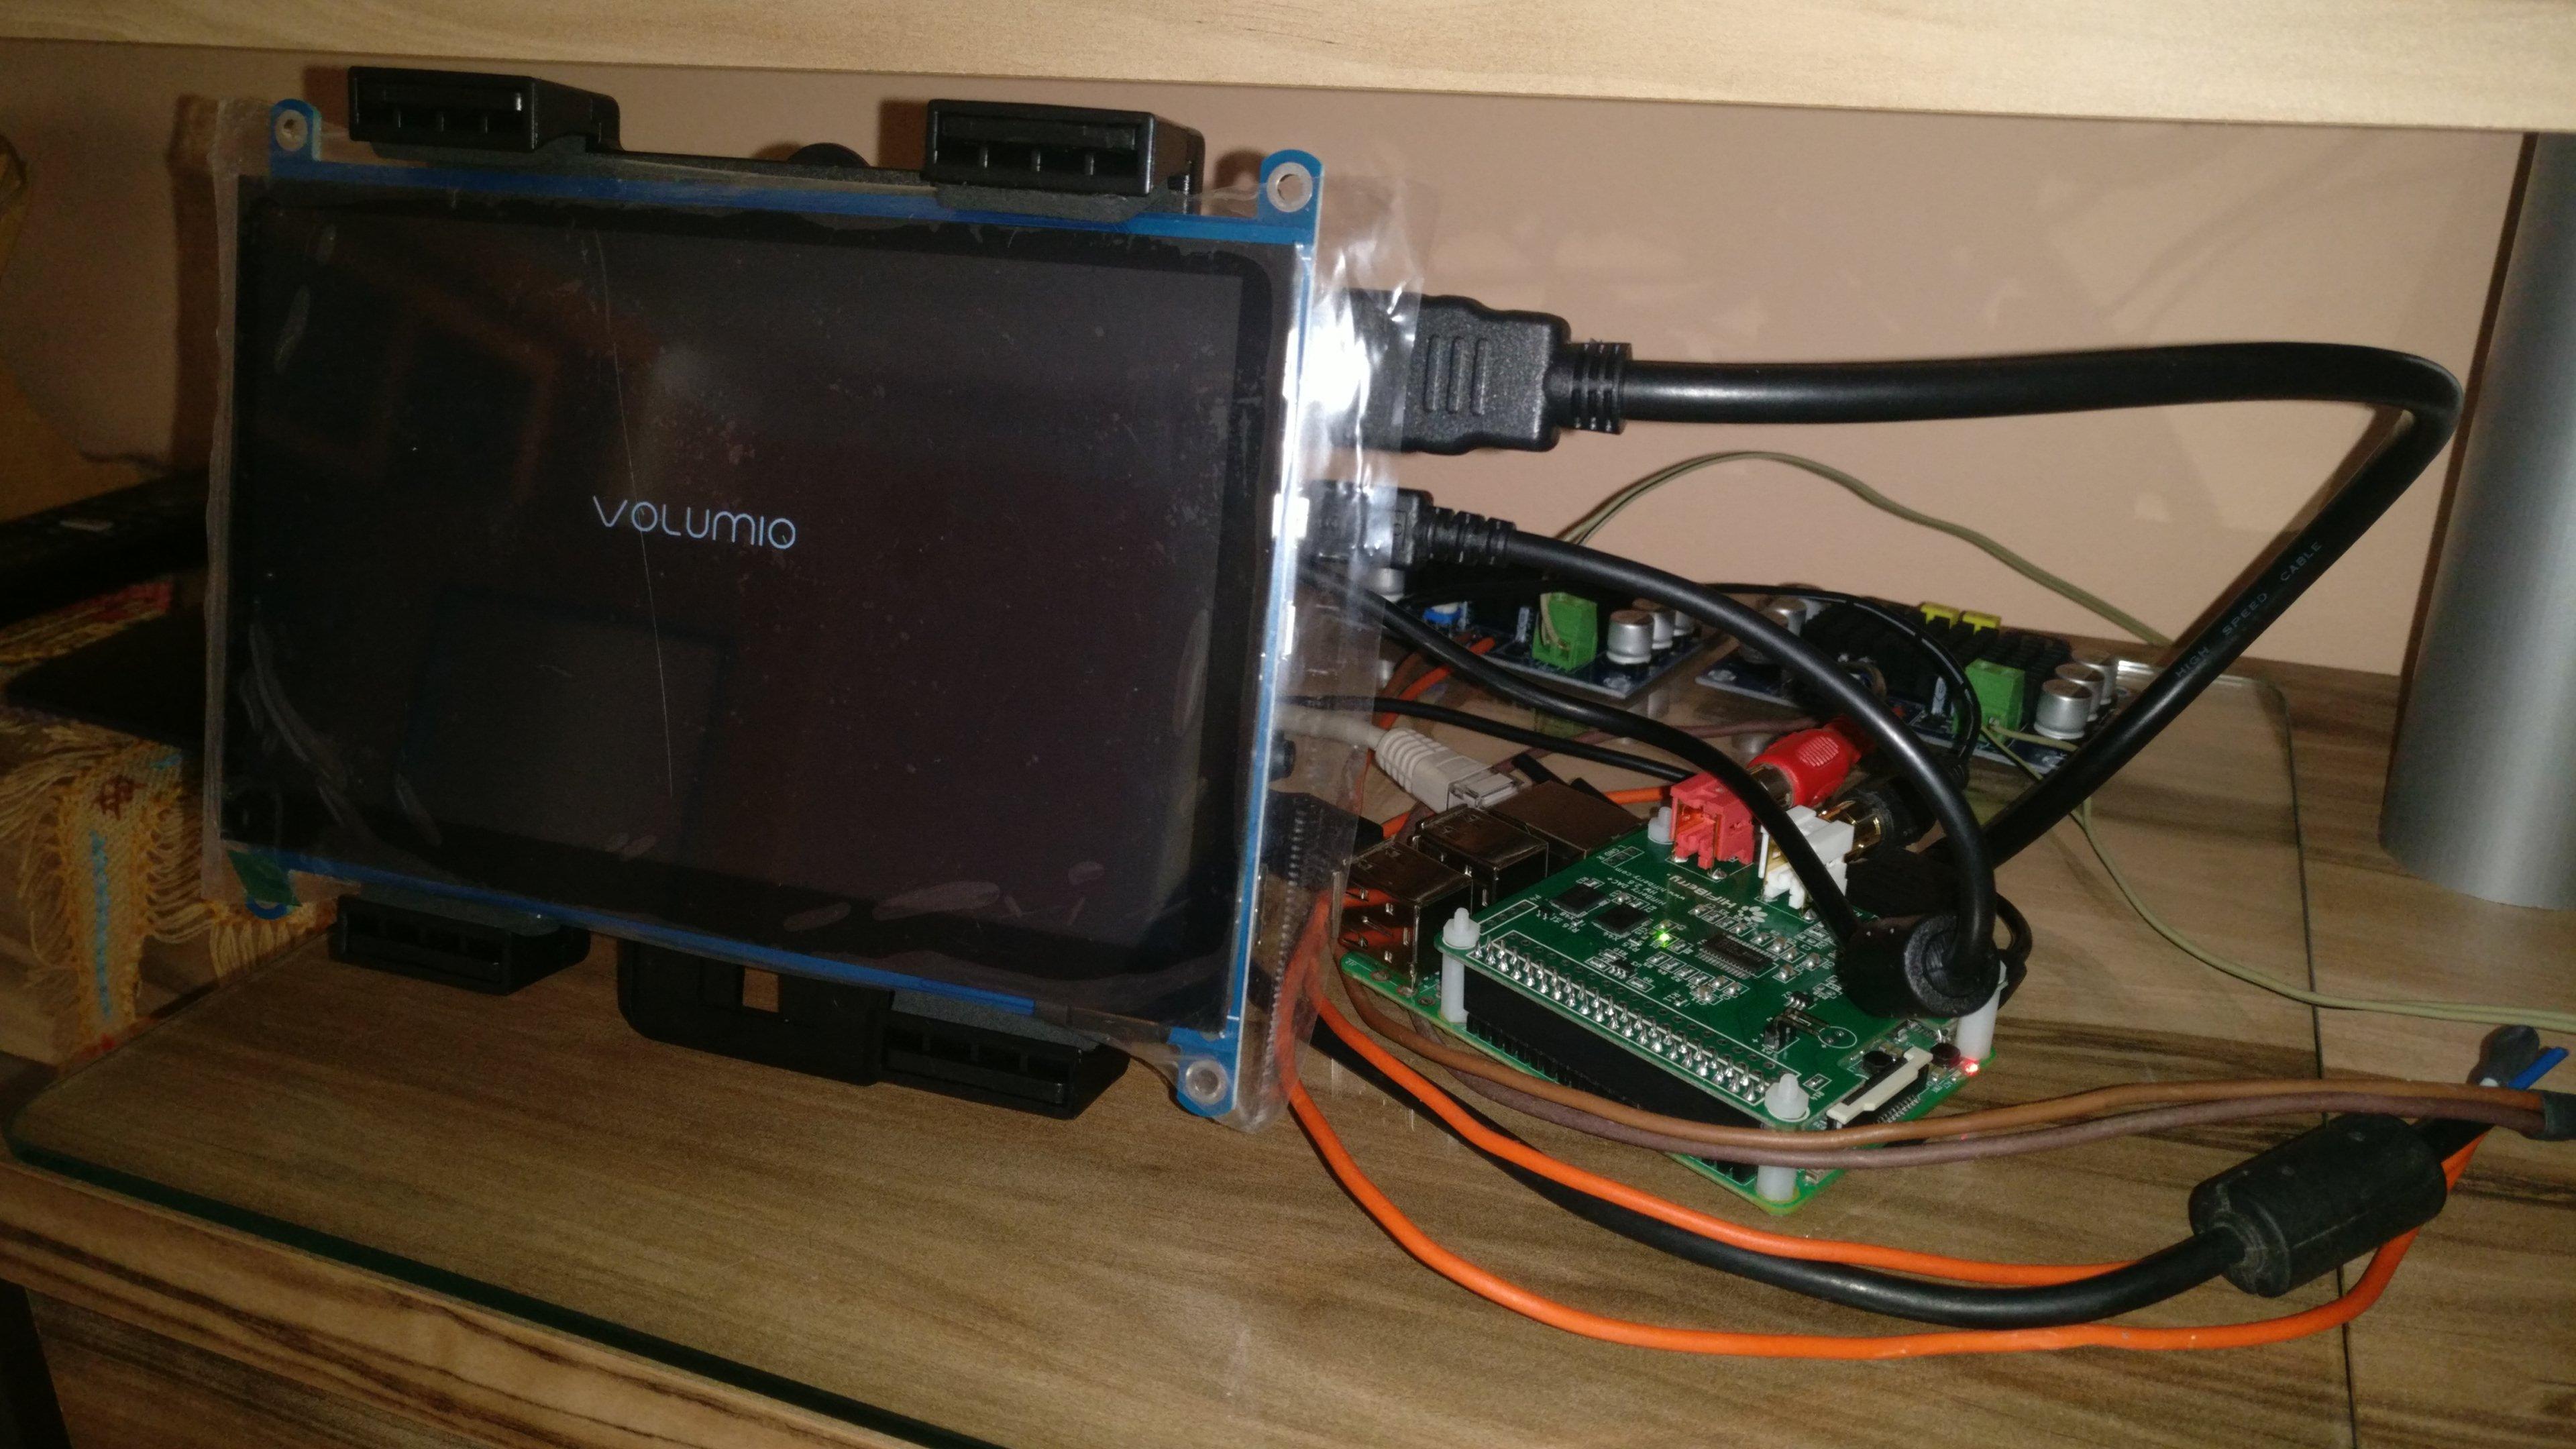 DIY radio with Raspberry Pi 3 and Volumio  In-Progress - DIY